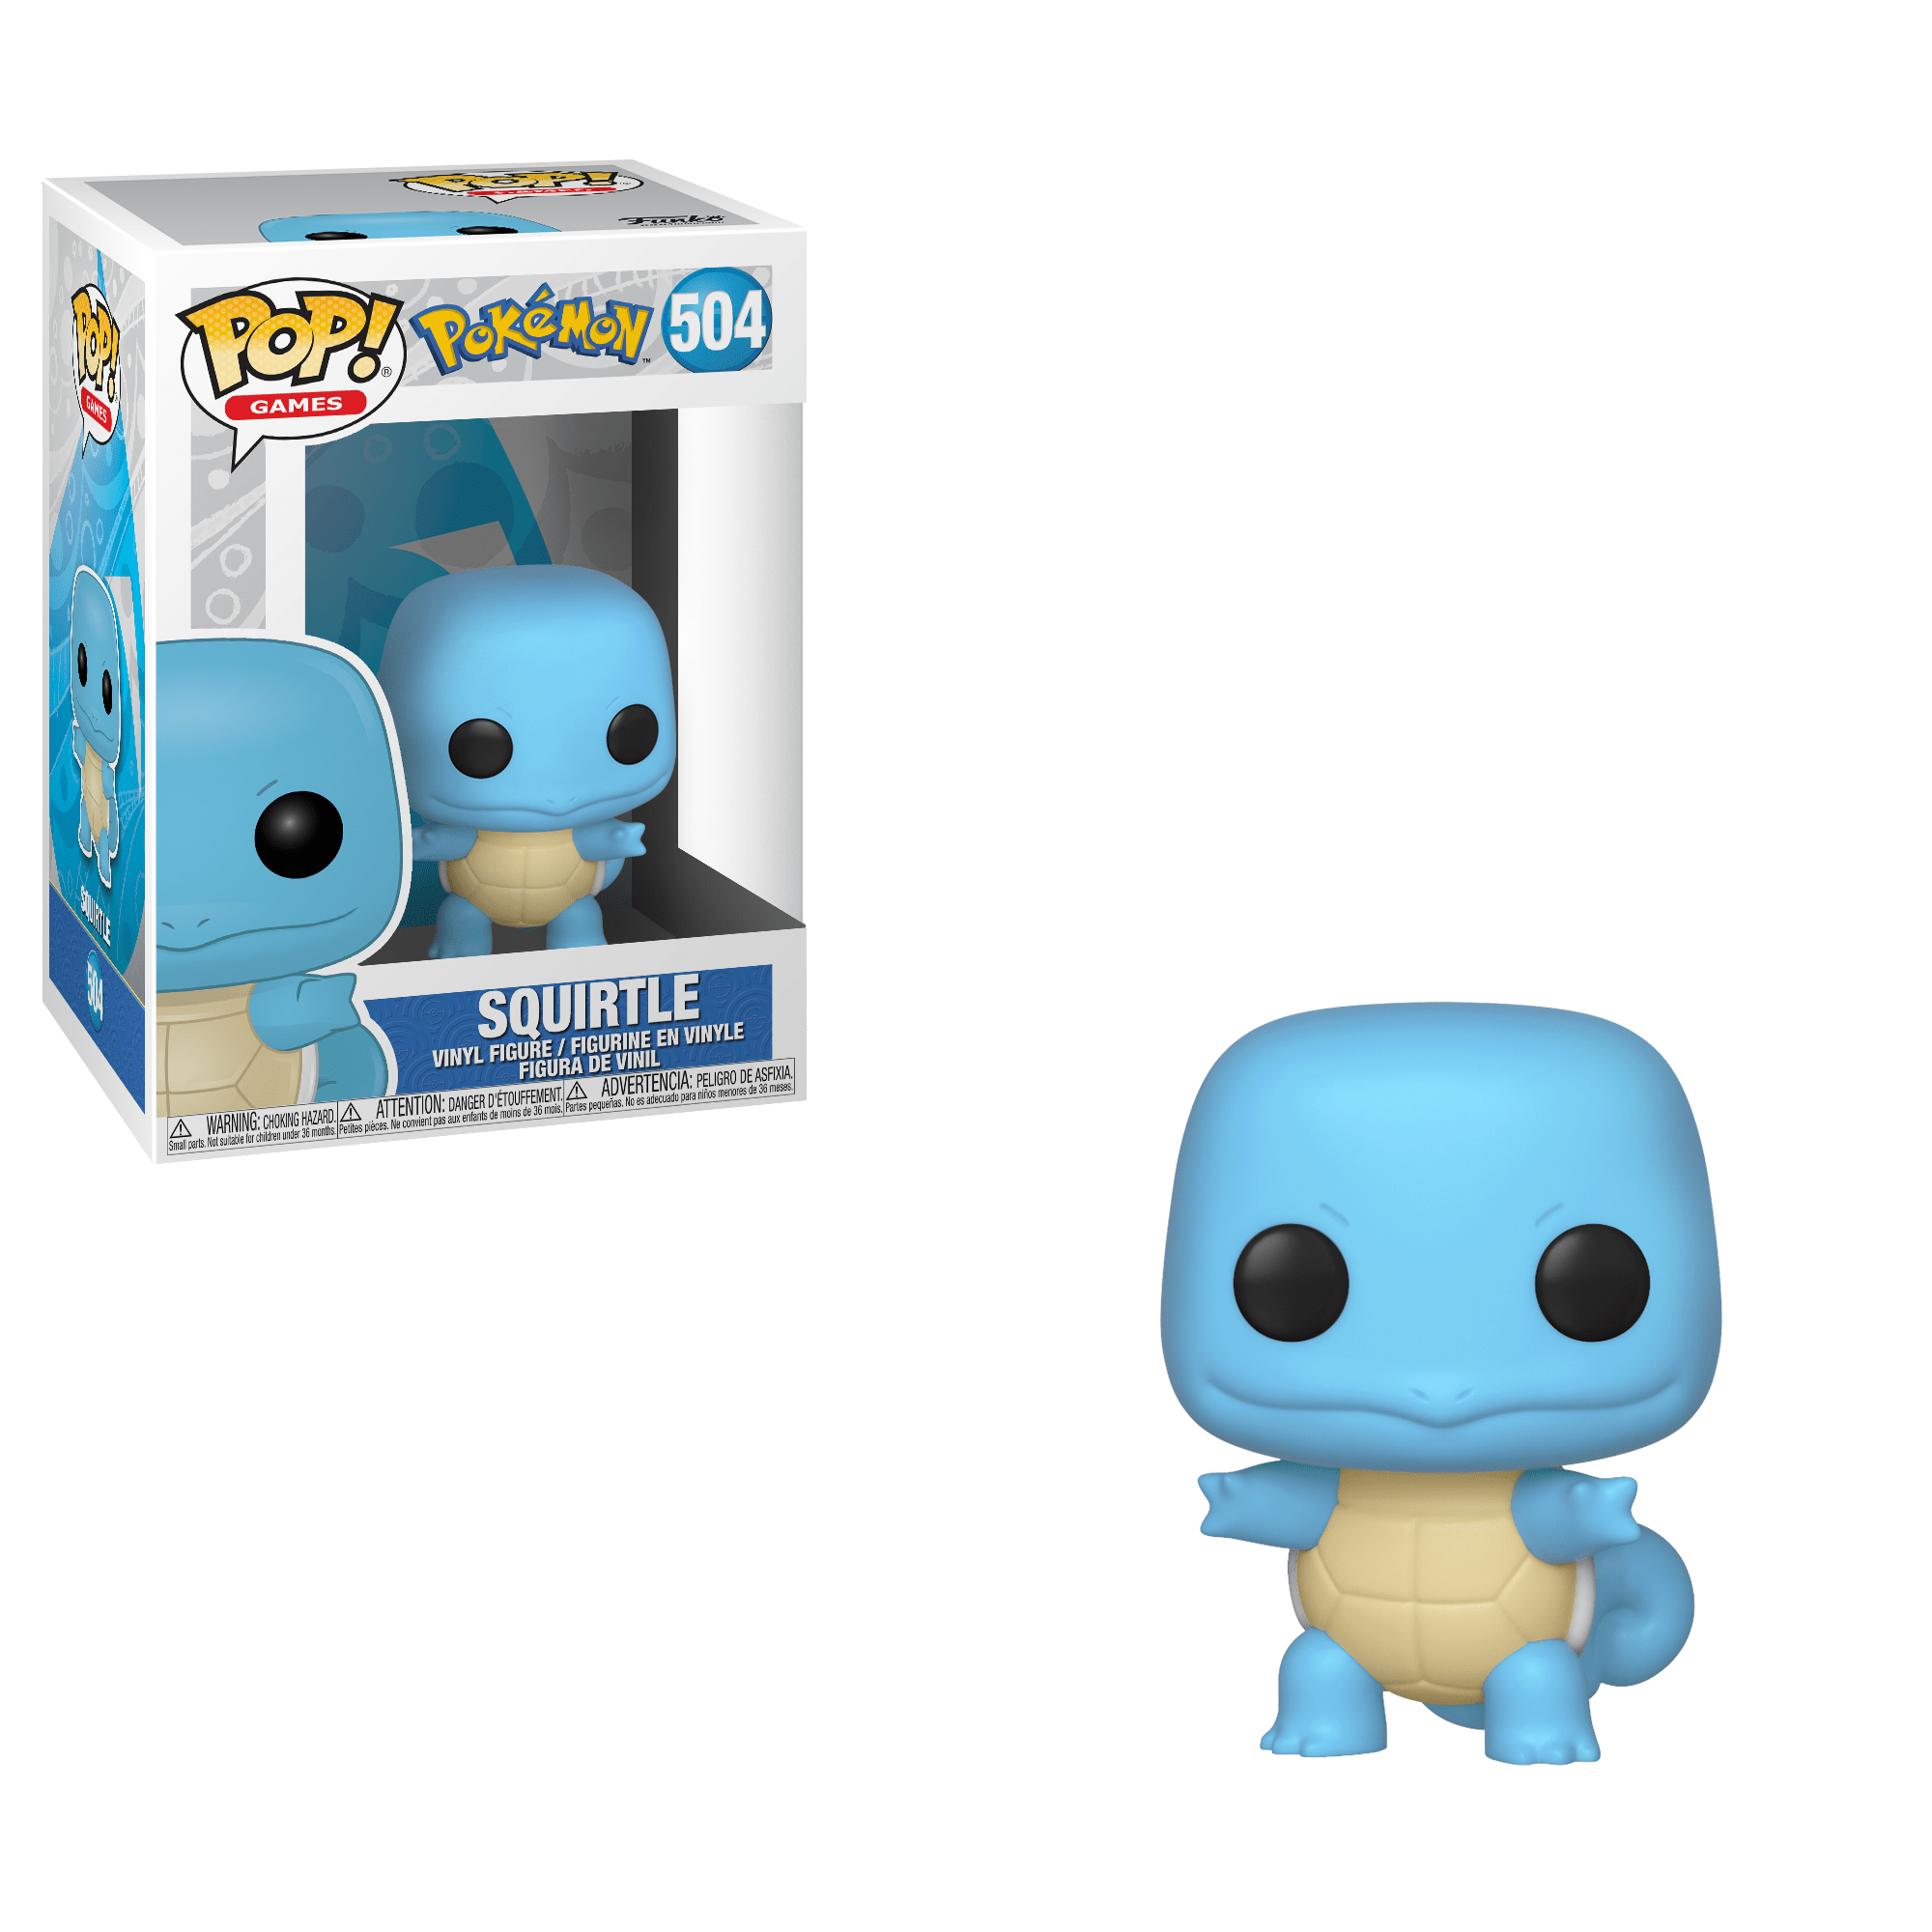 Pop! Pokémon: Squirtle